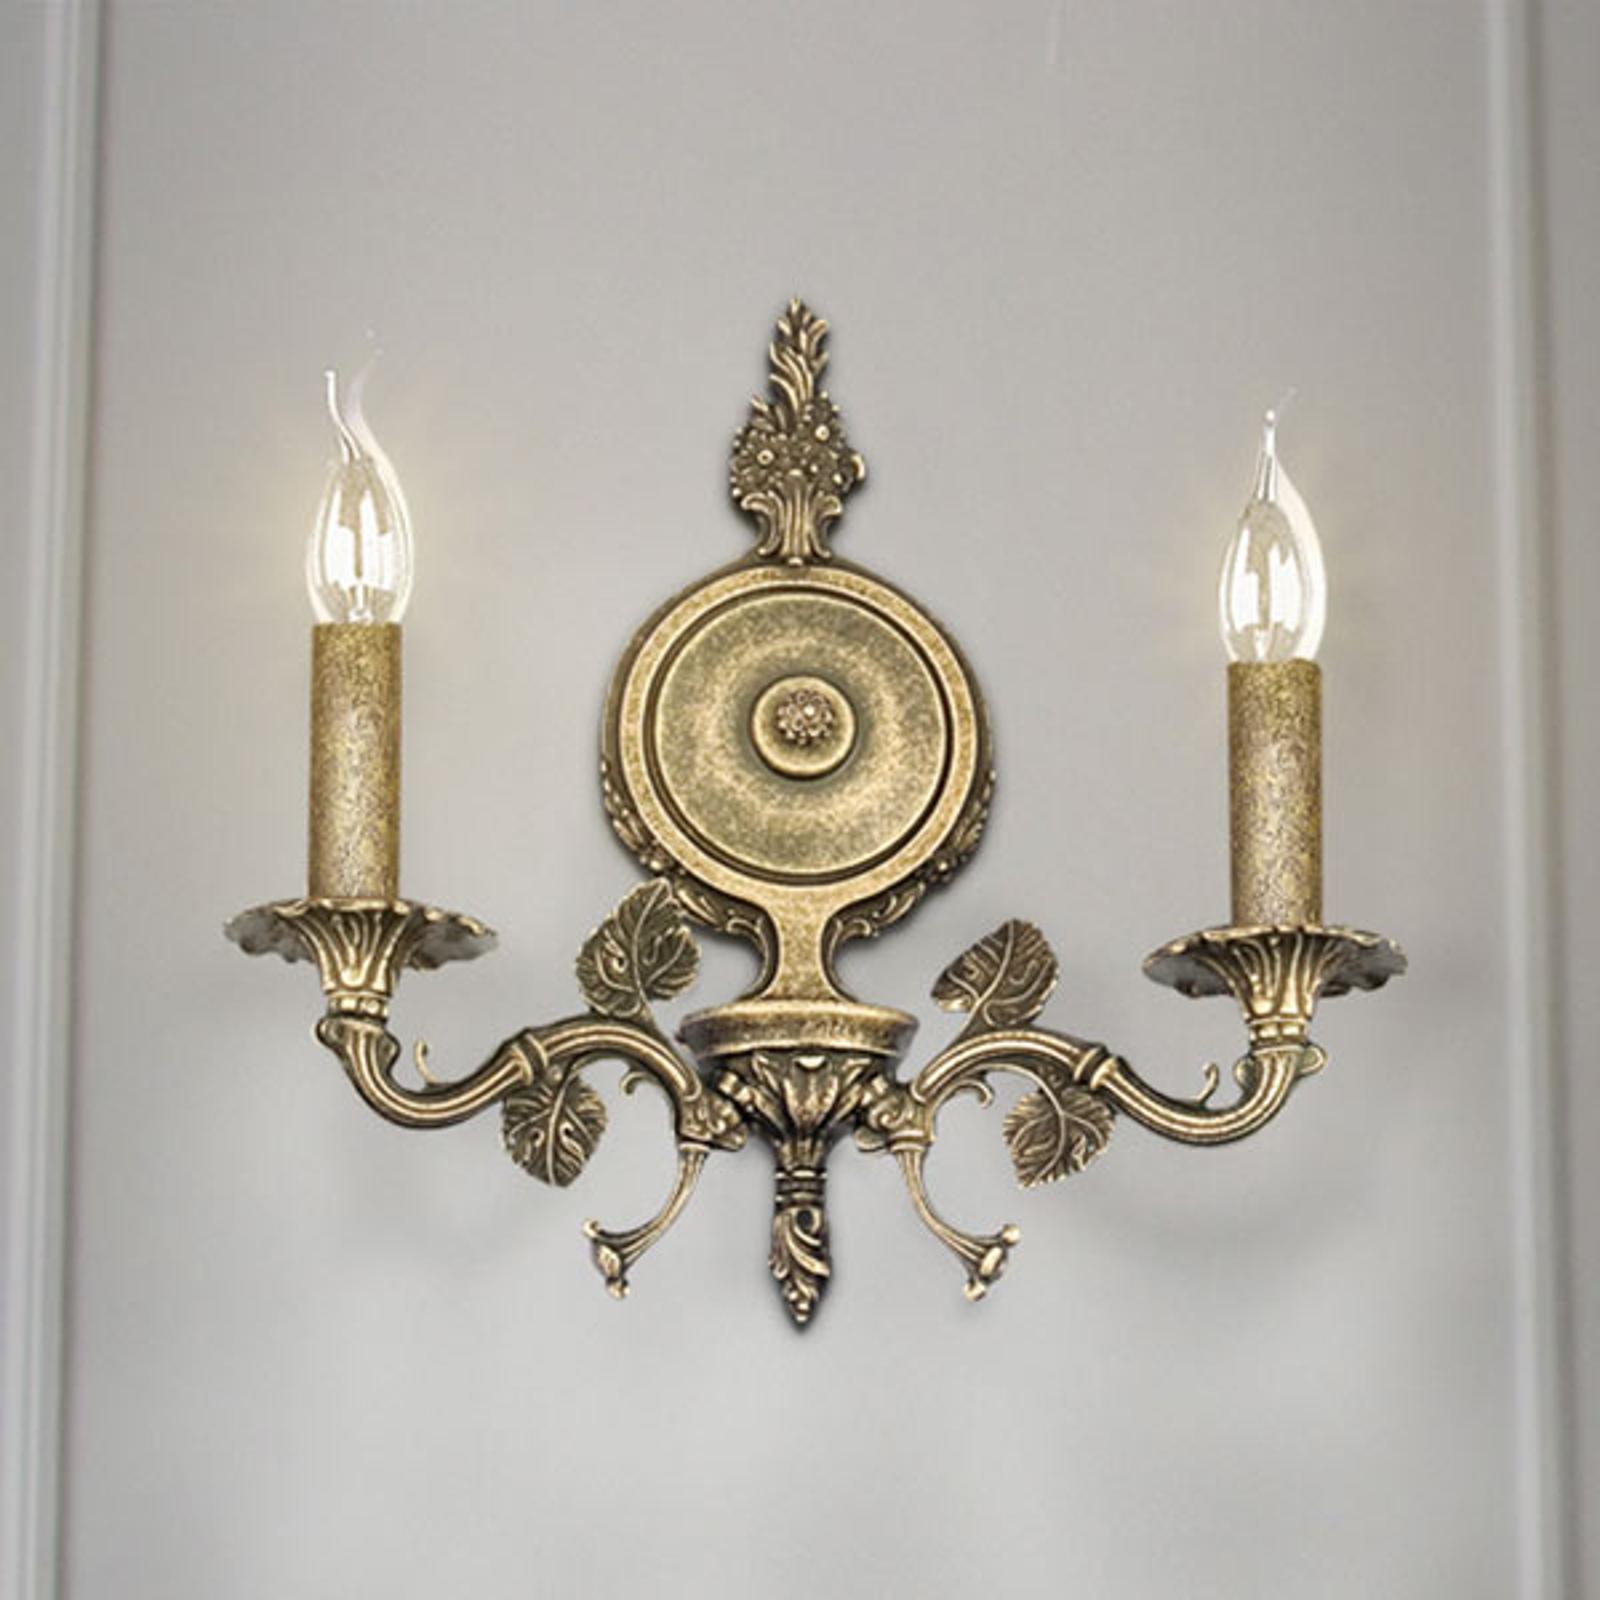 Væglampe Albero, 2 lyskilder, antik bronze